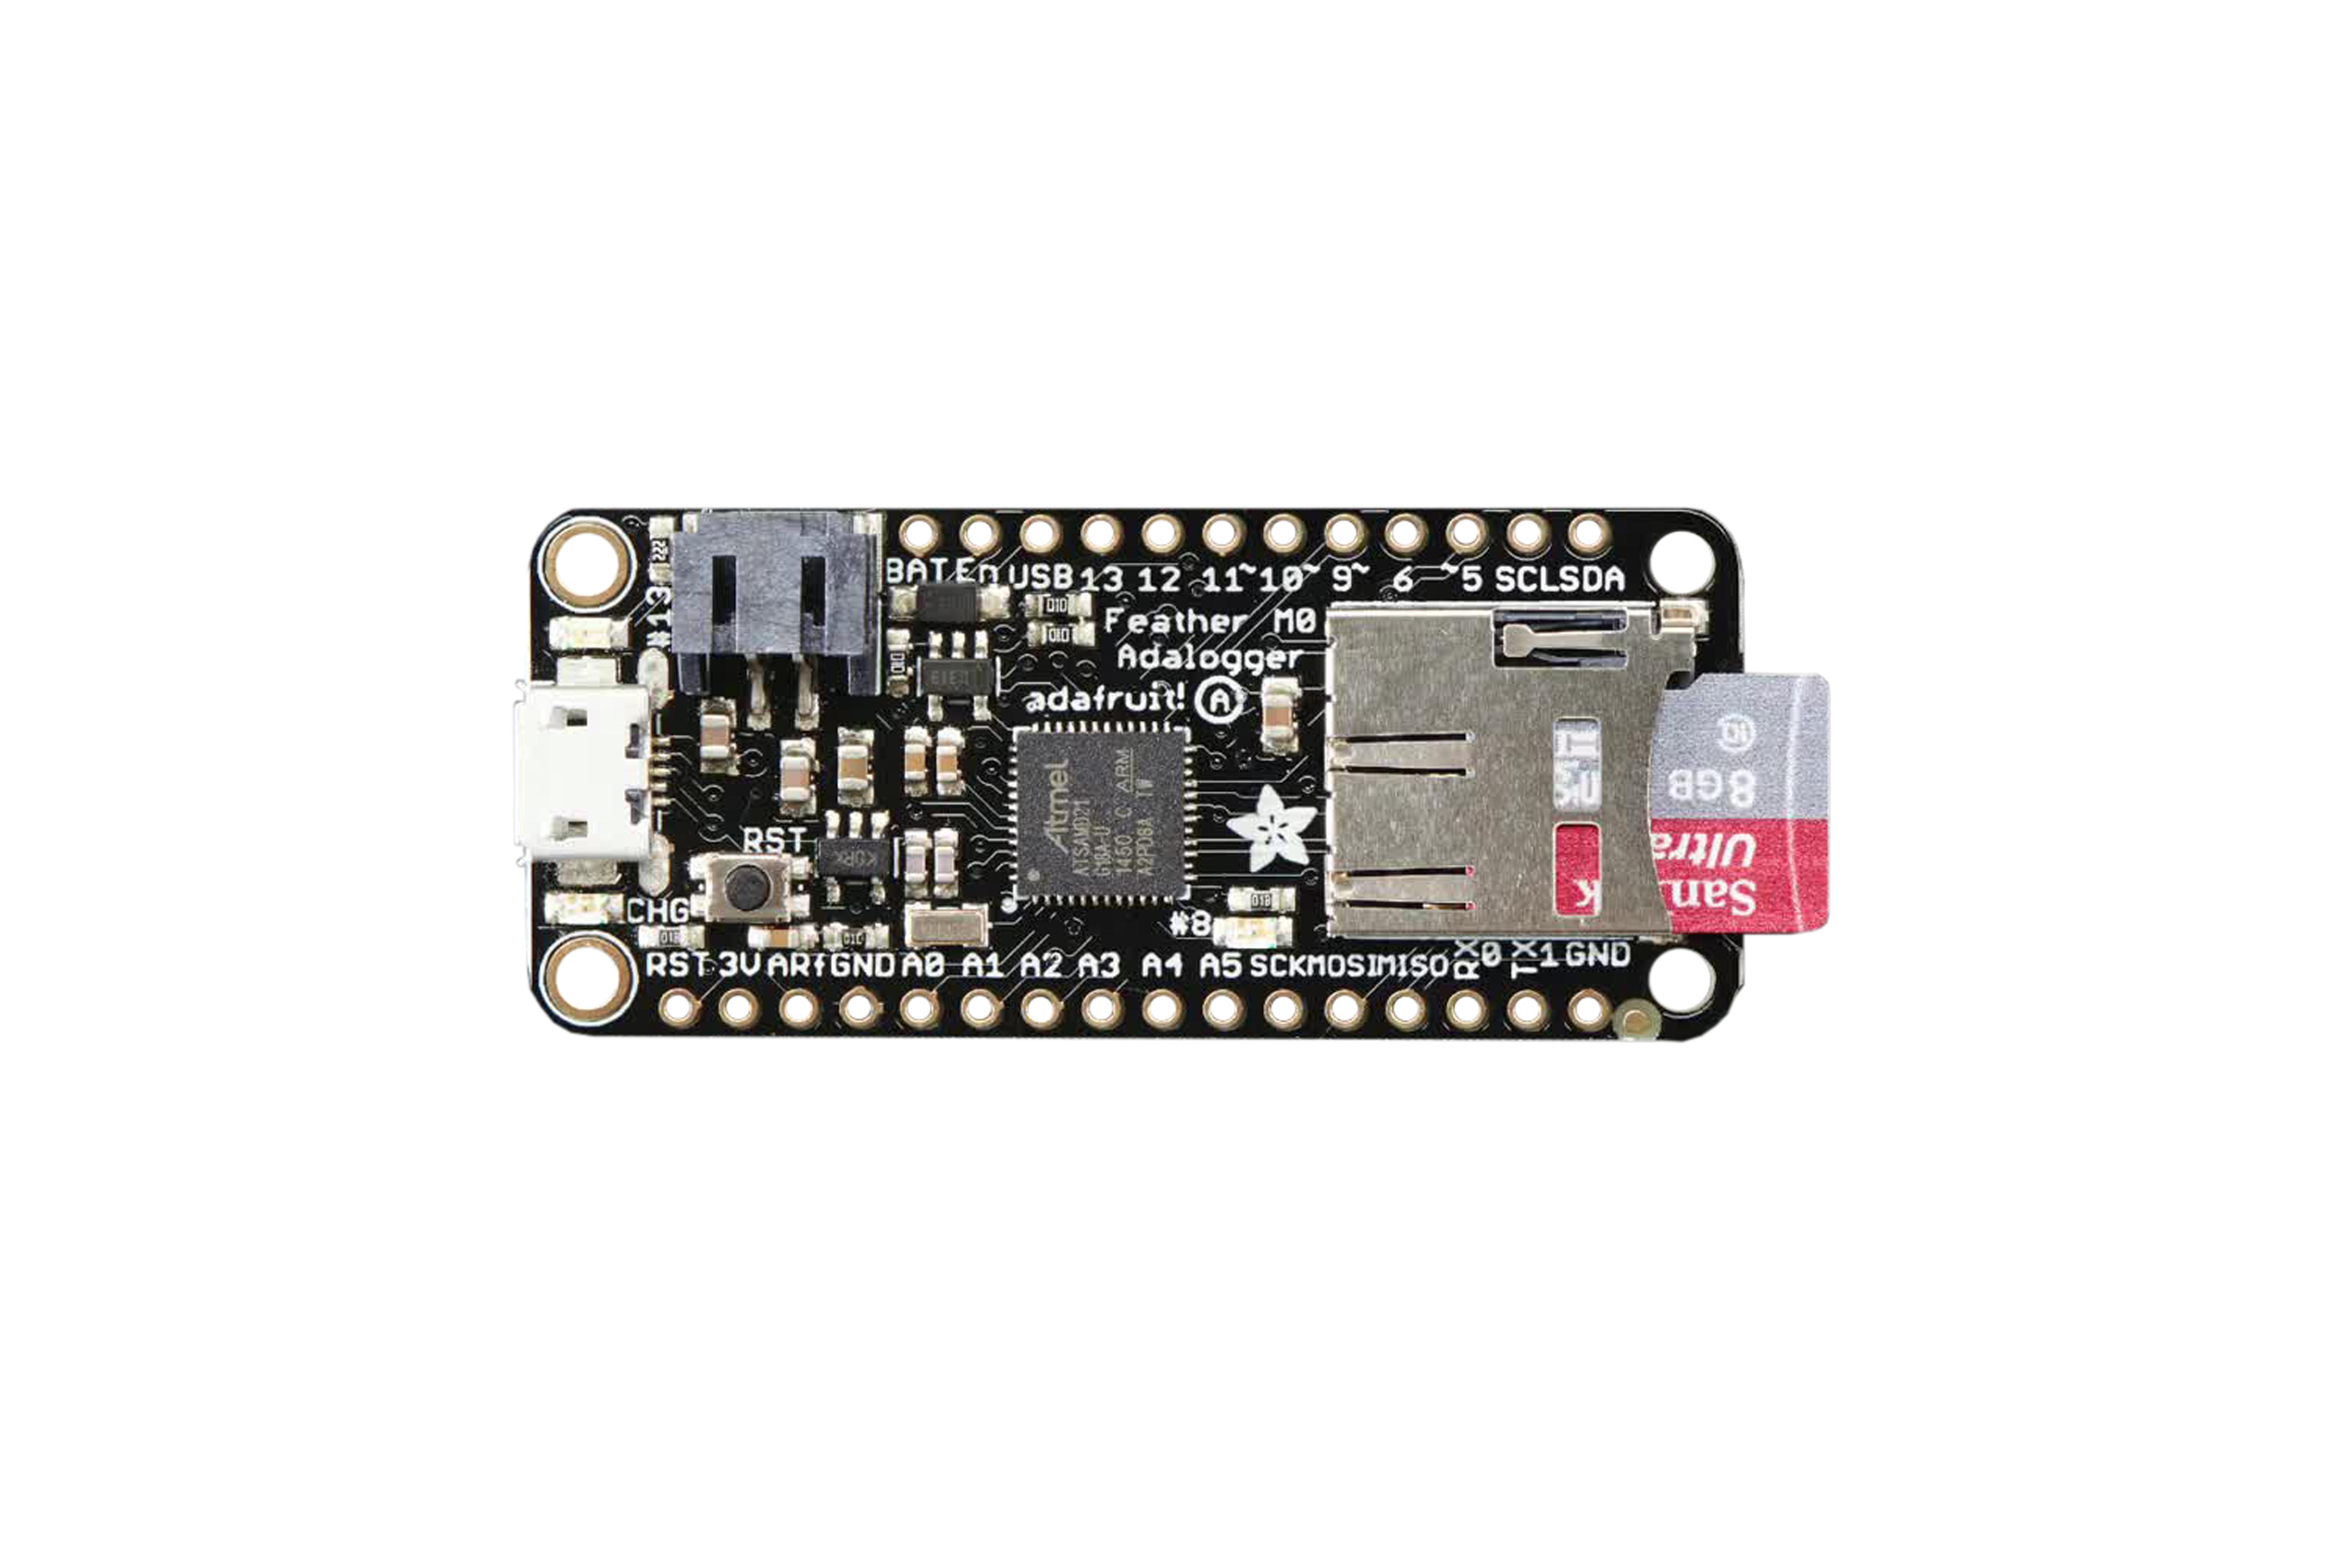 Adafruit Feather(アダフルーツ・フェザー) Cortex-M0 Adalogger